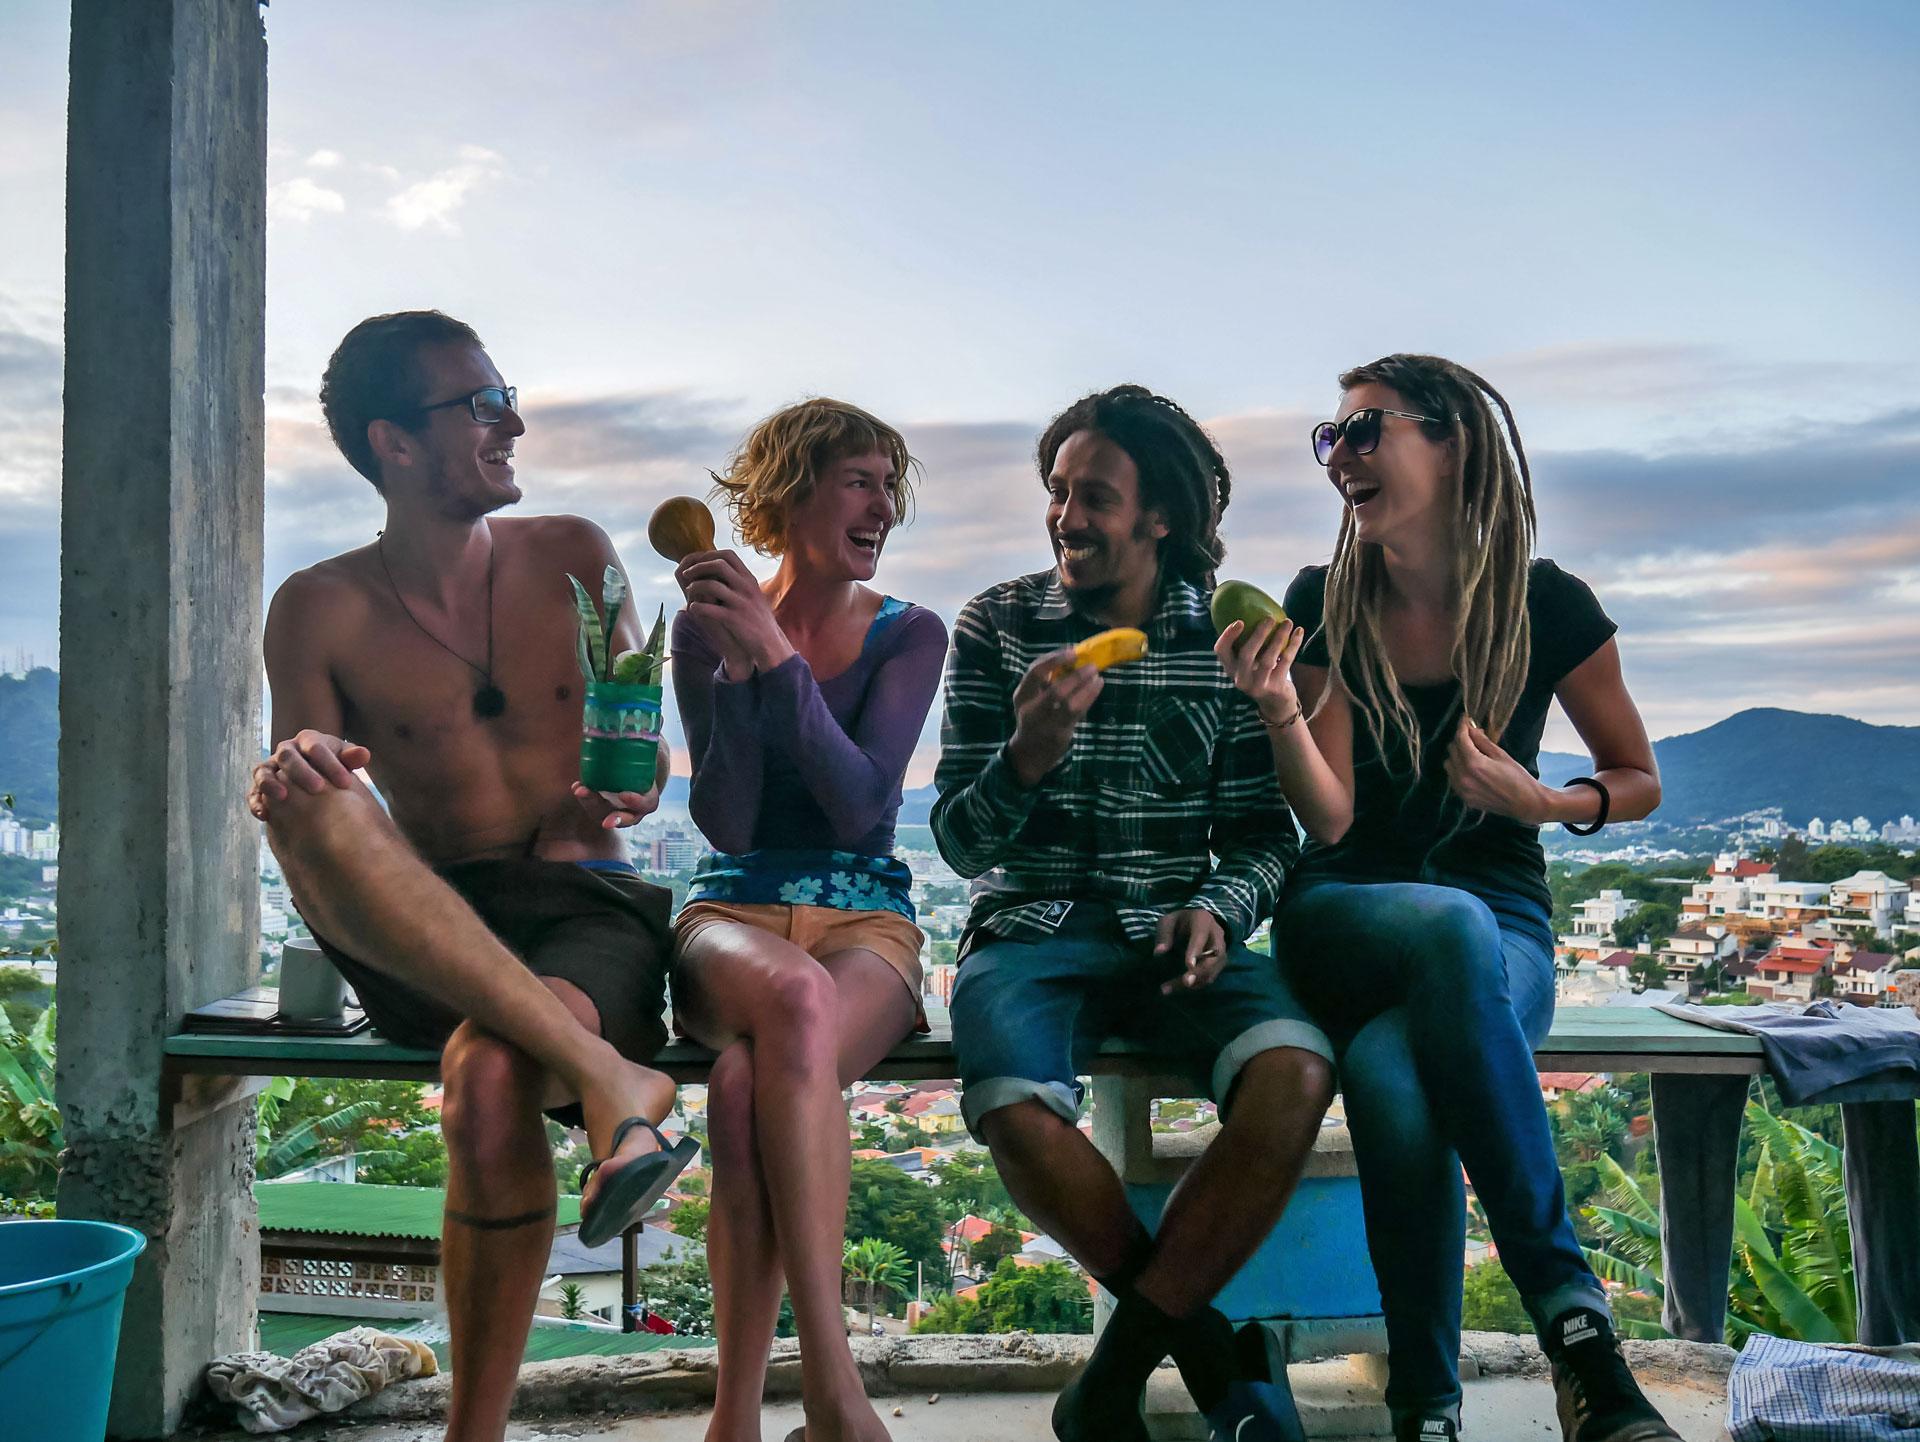 Rasta couple with friends in Florianópolis, Brazil